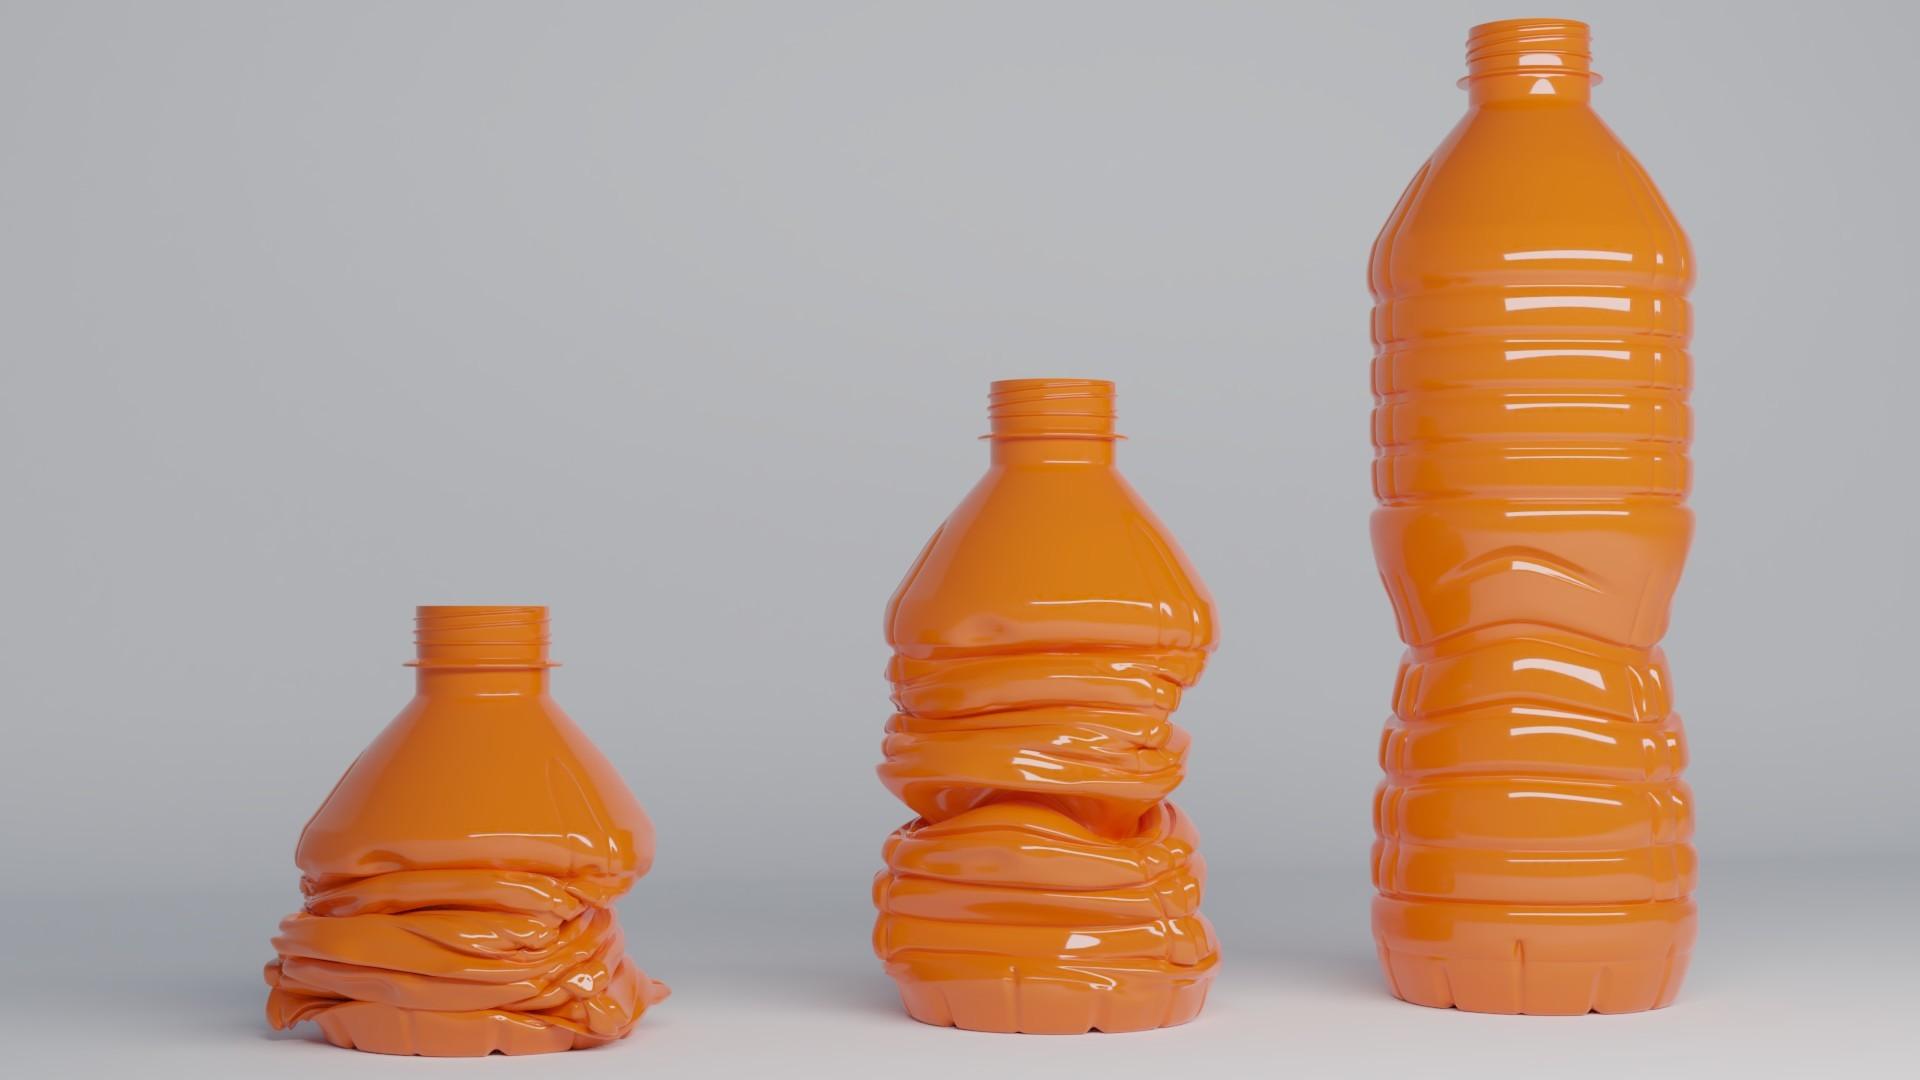 Francois rimasson bottle01